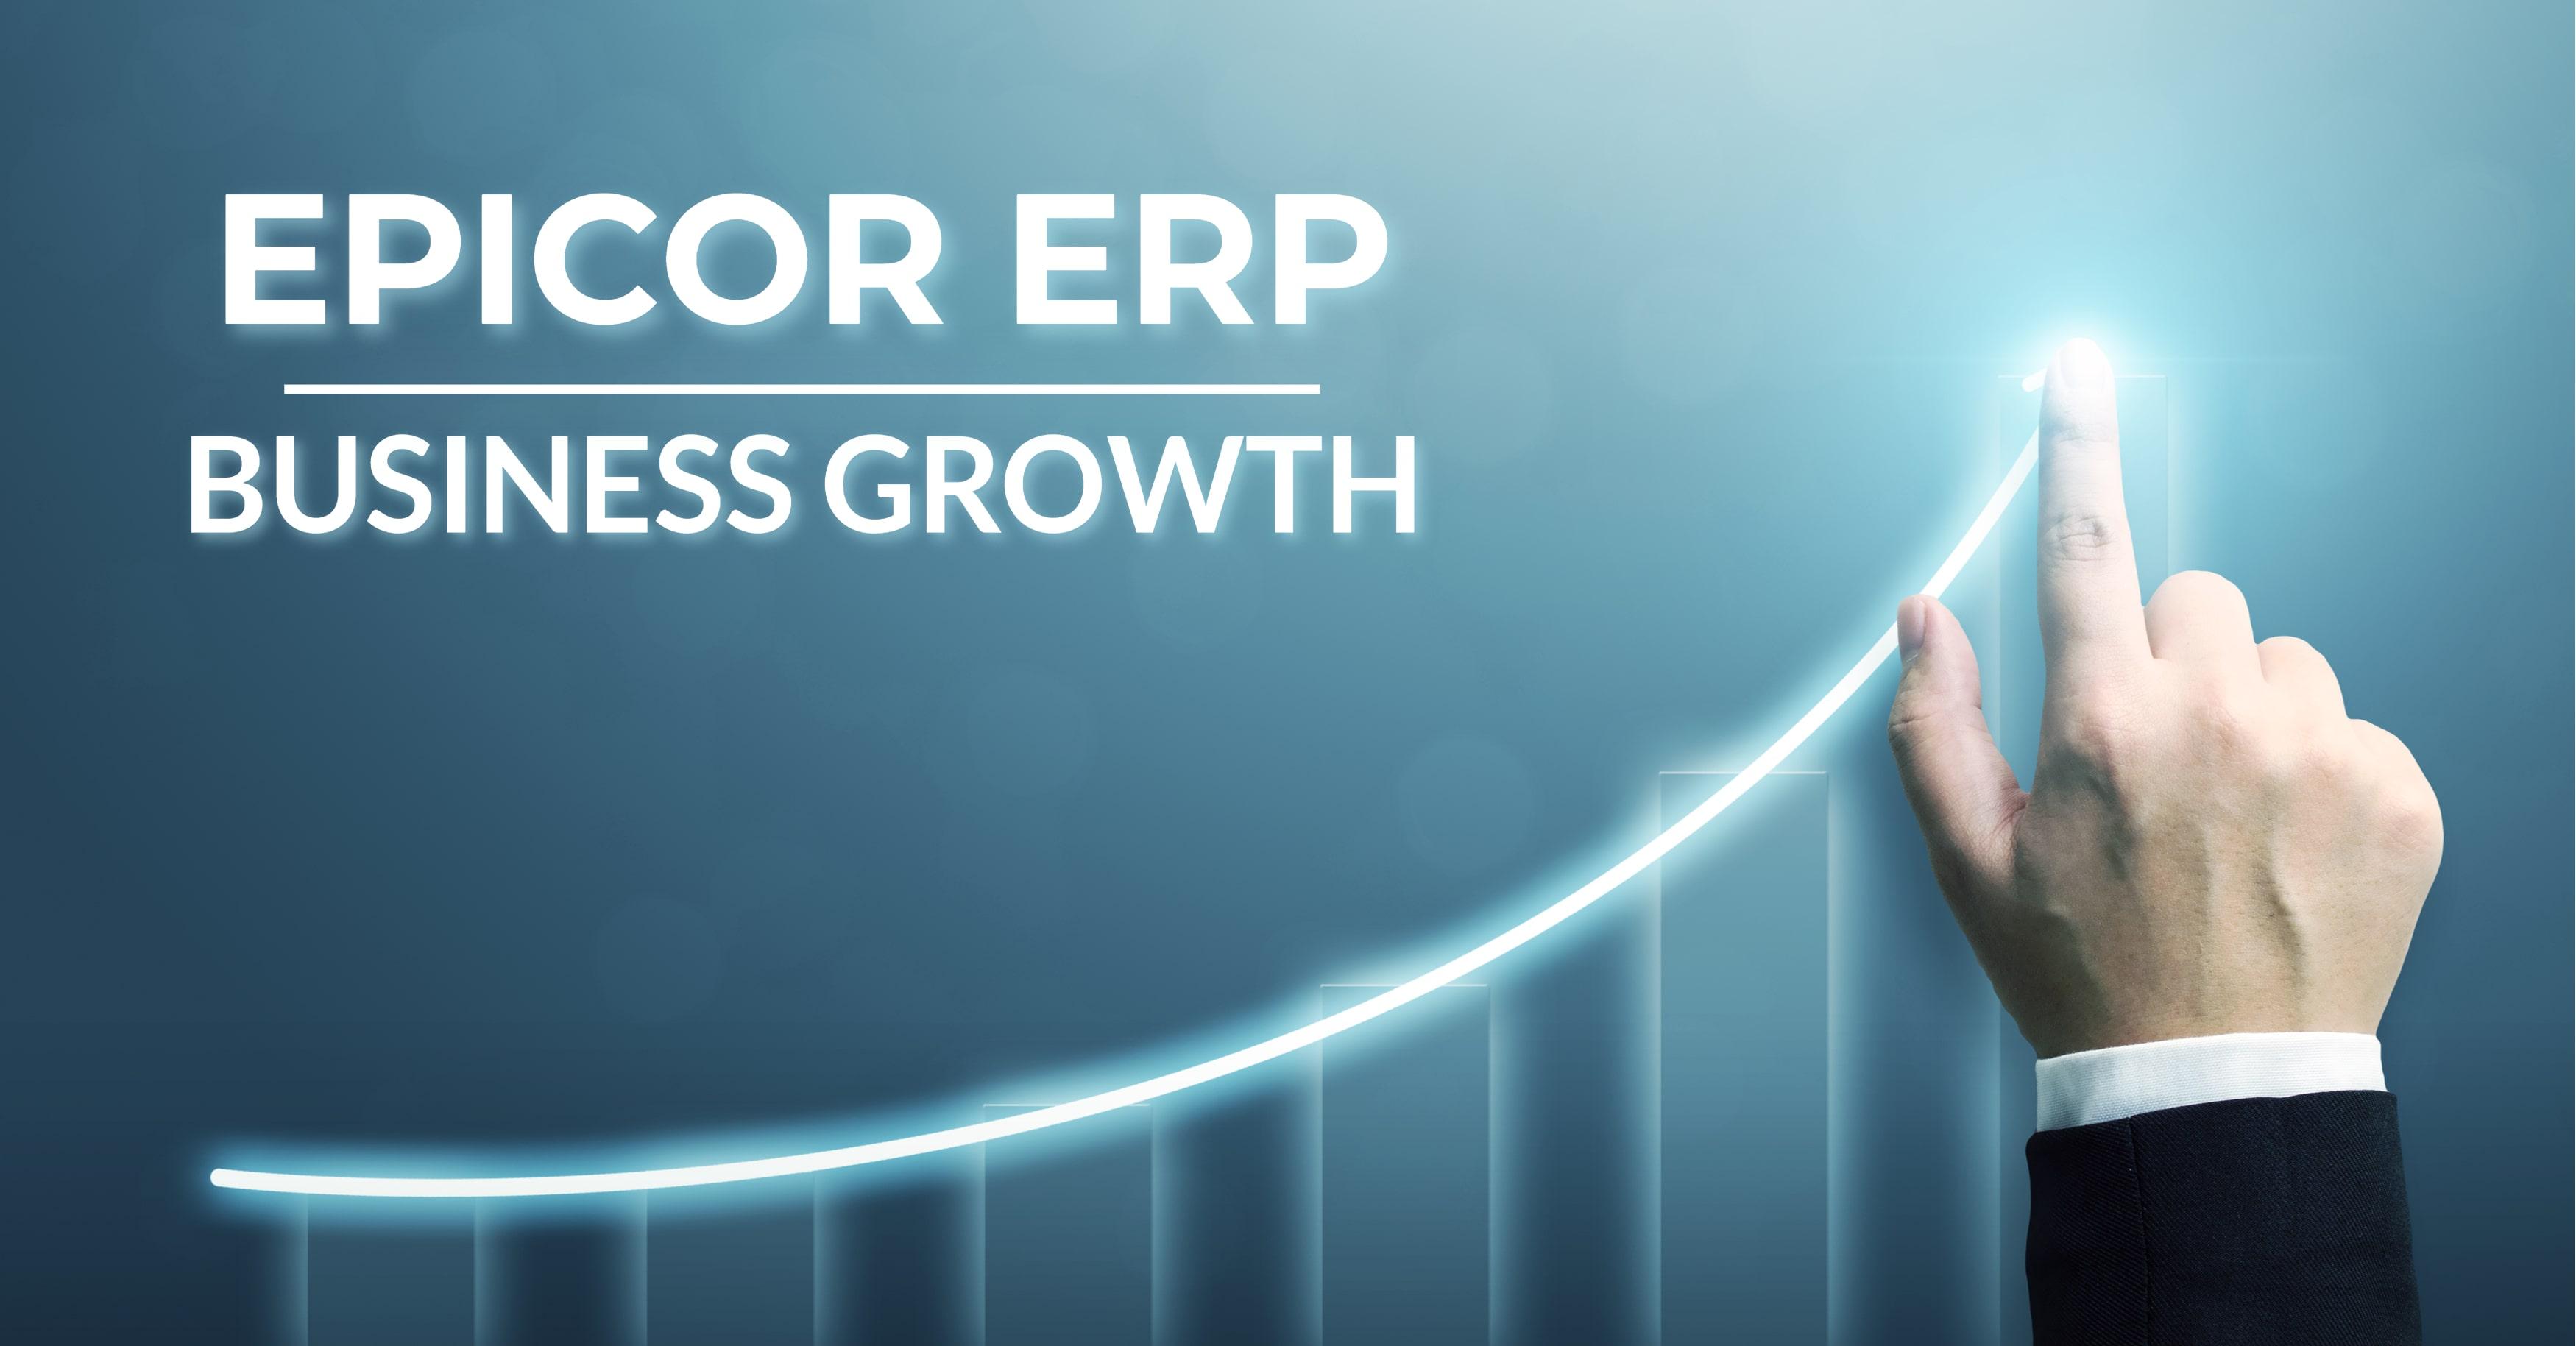 Epicor ERP Business Growth